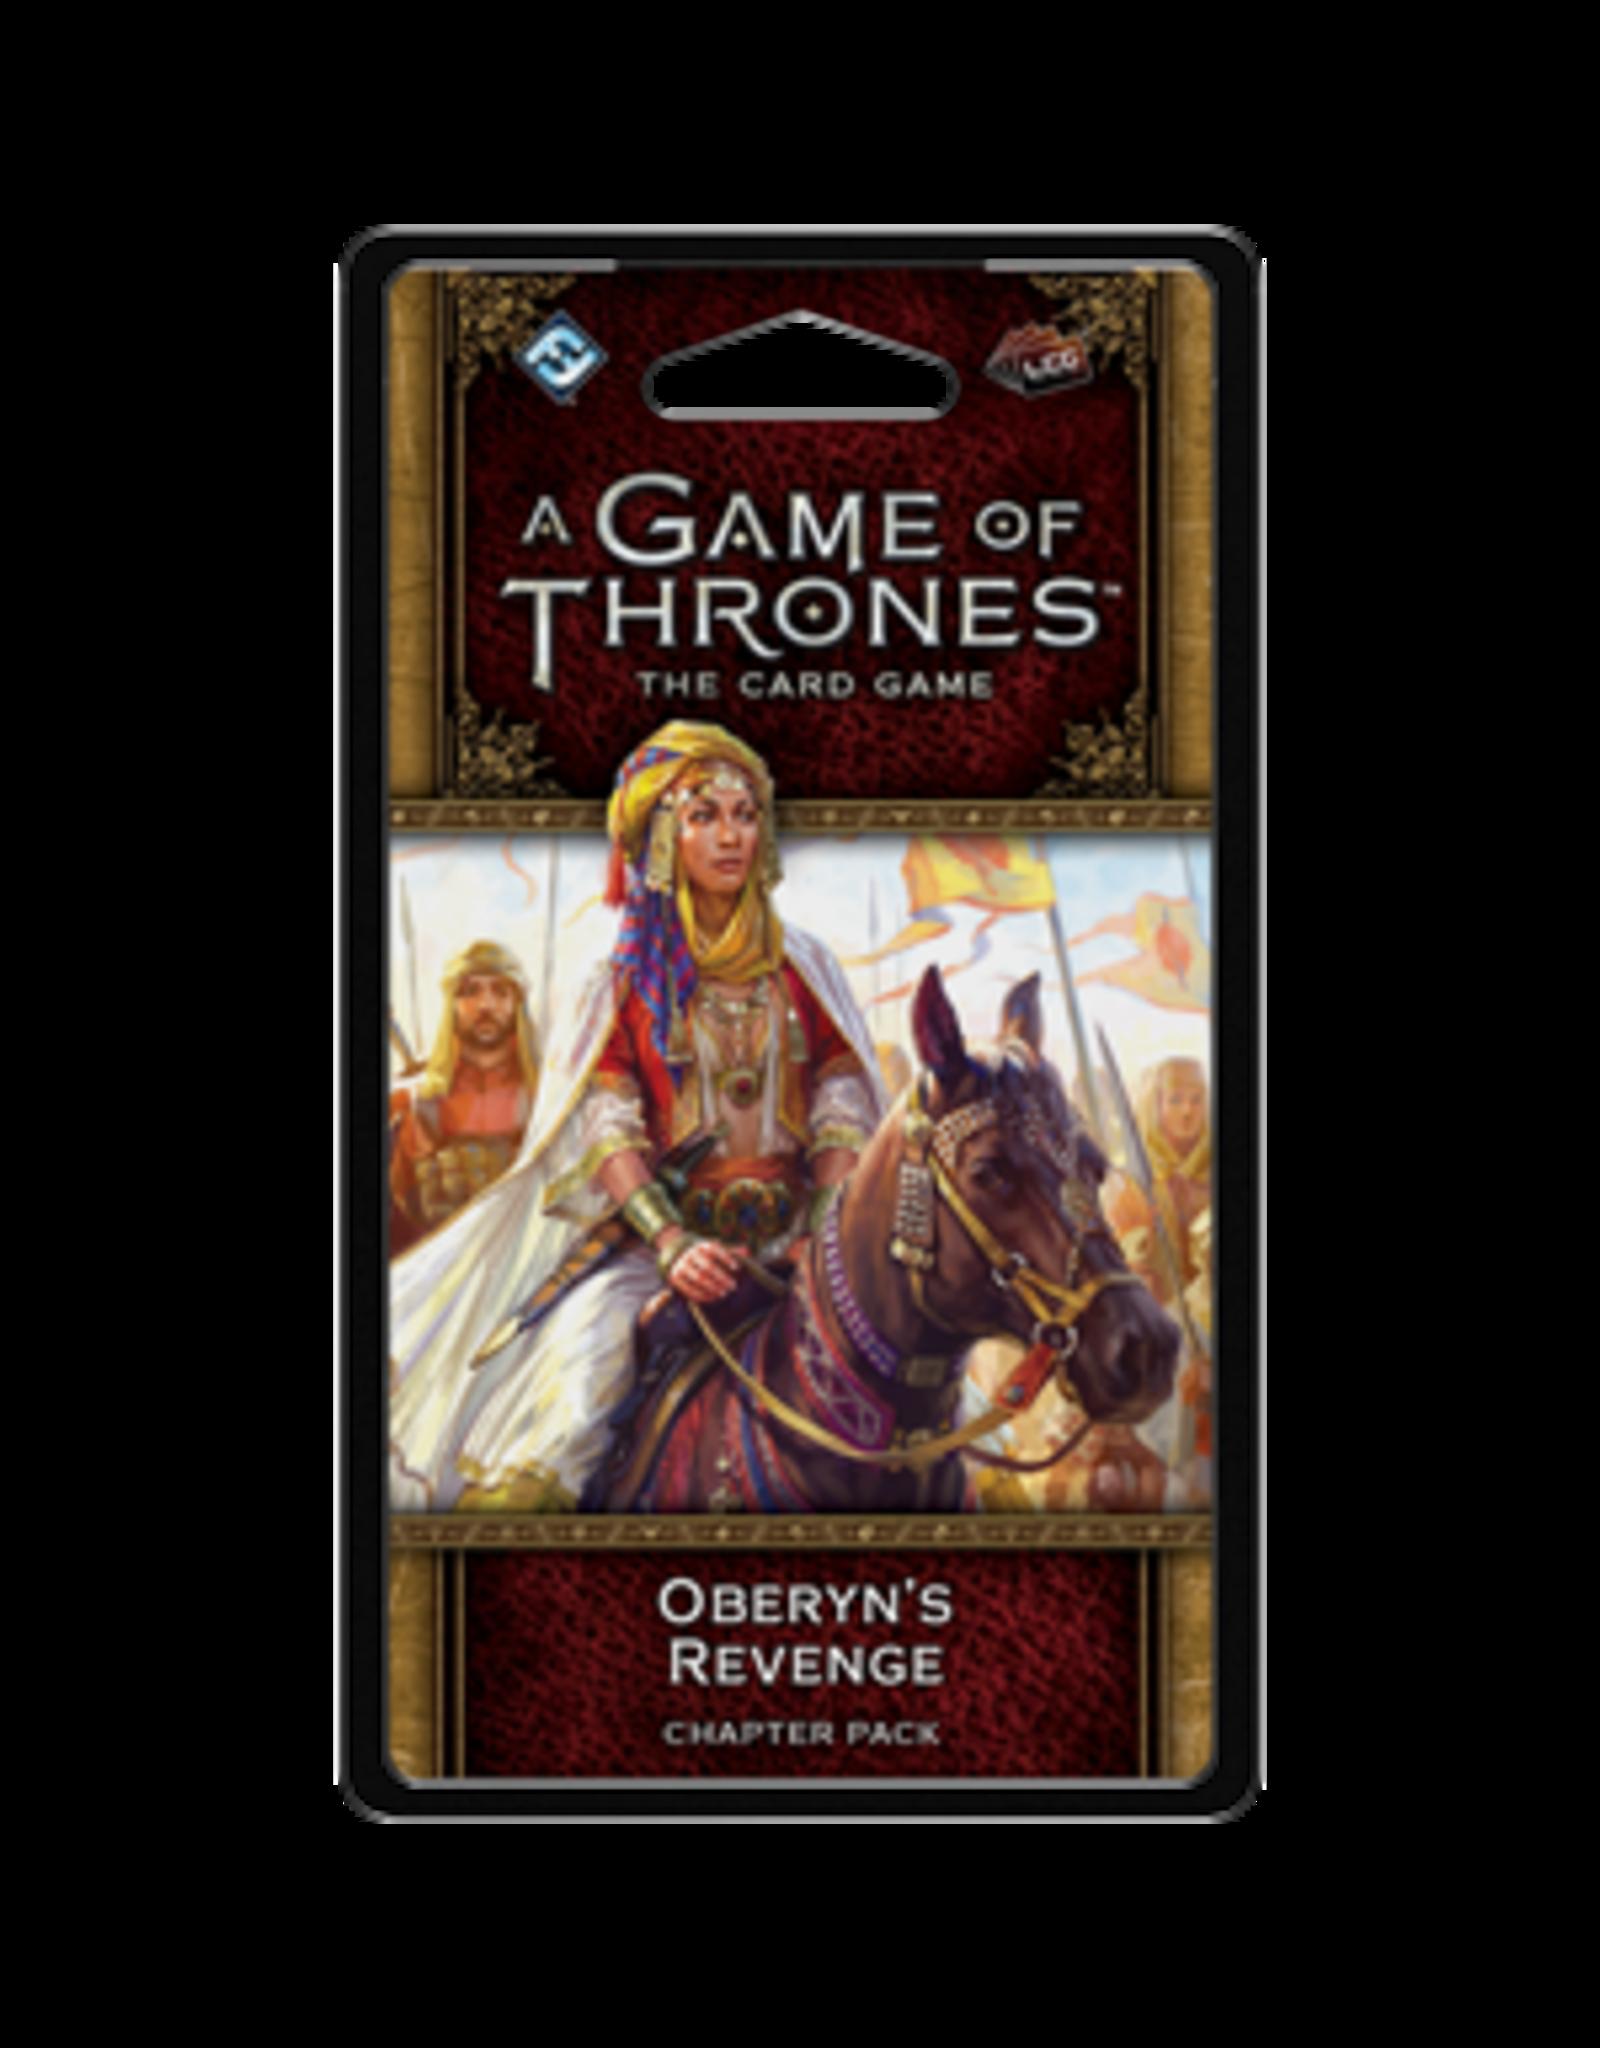 Fantasy Flight GAME OF THRONES LCG: OBERYN'S REVENGE